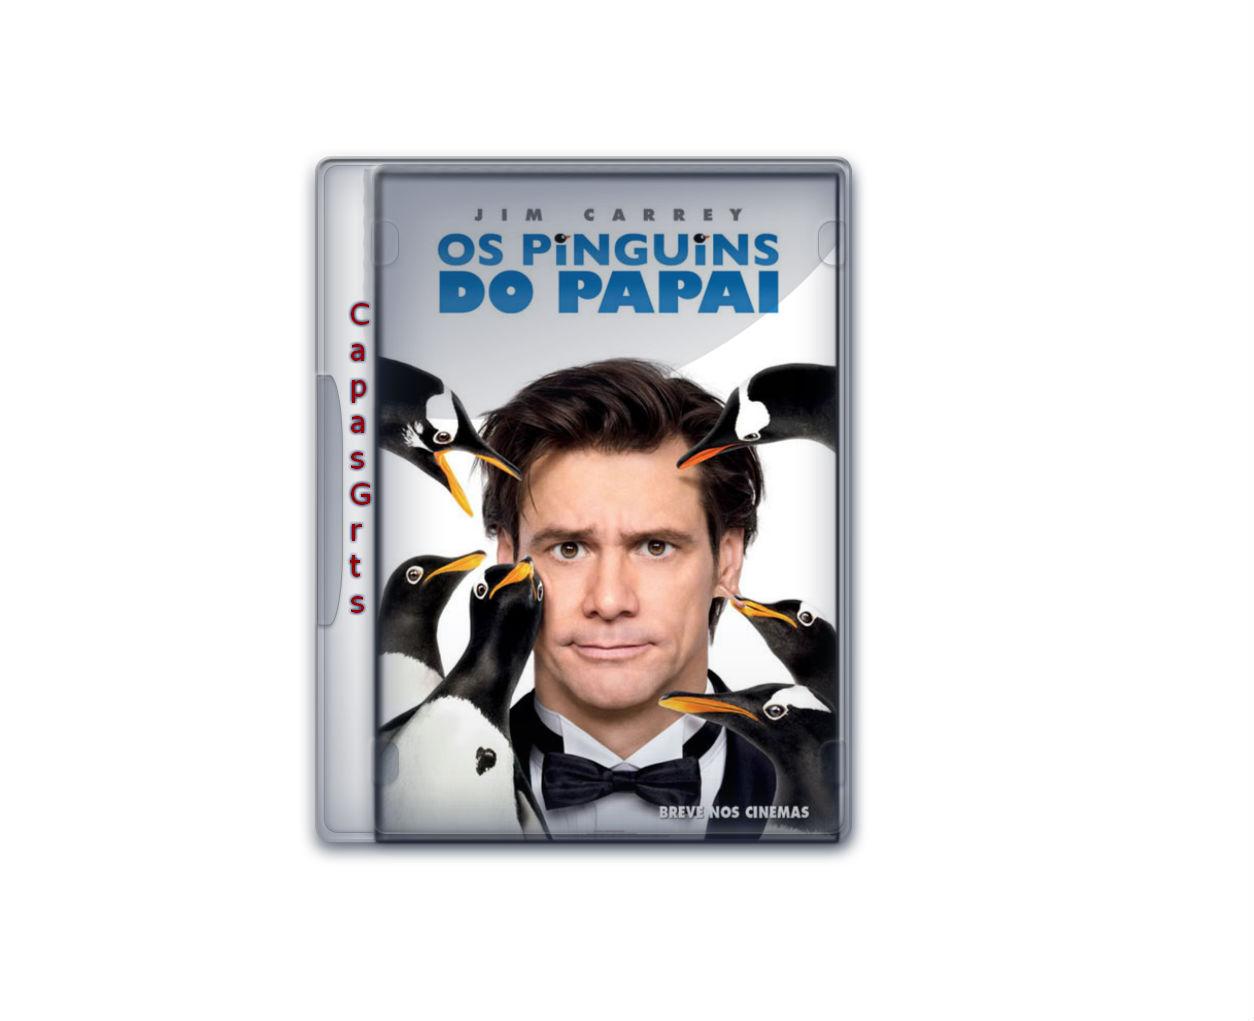 http://3.bp.blogspot.com/-2DZfPKhKsC4/TlCKUDkSMGI/AAAAAAAAAnM/CJFiPRsv-6A/s1600/Capa+DVDpinguins.jpg